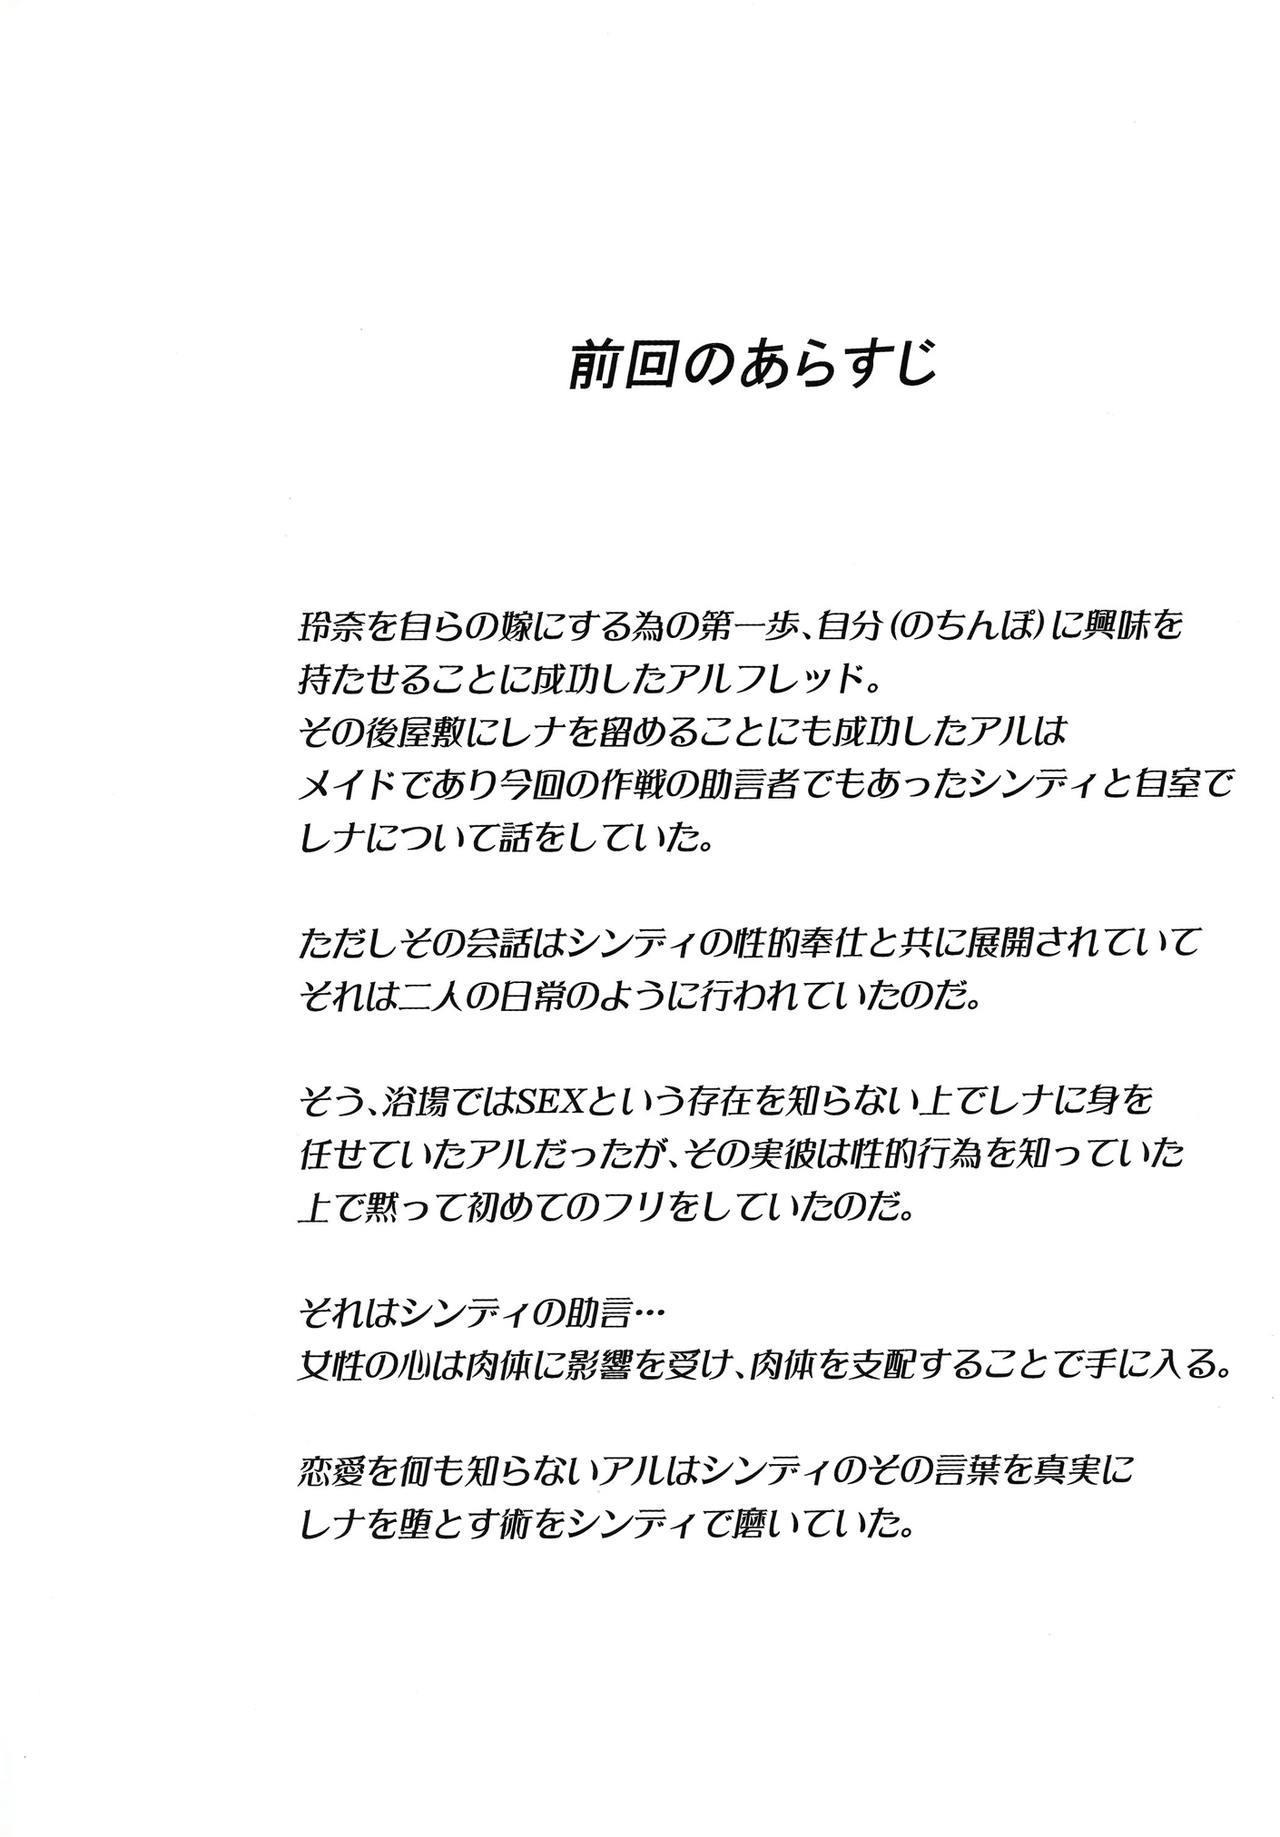 Gal Shota Cinderella 3 2